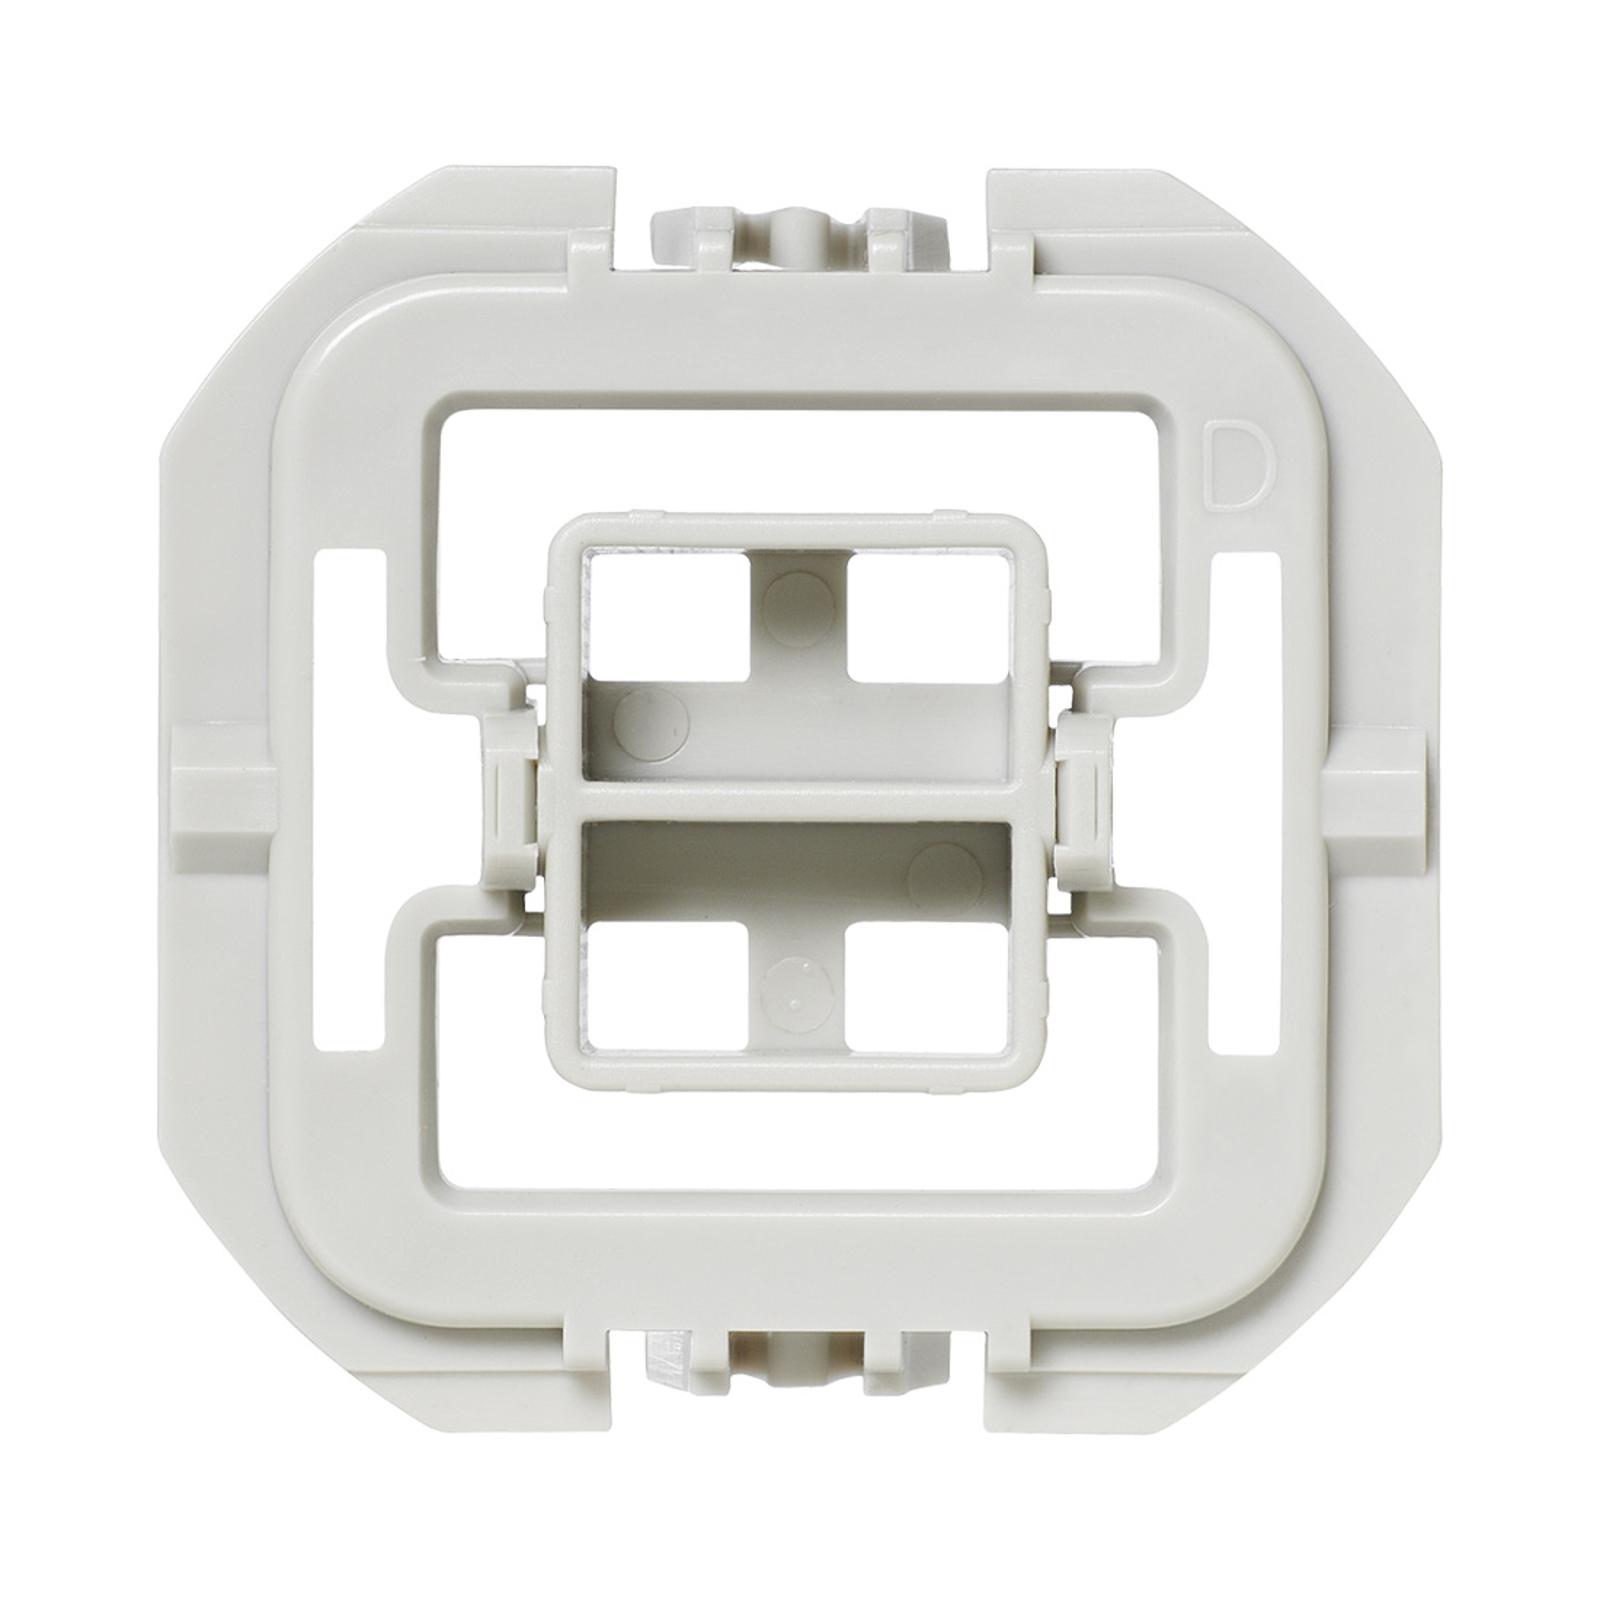 Homematic IP-adapter for Düwi/REV Ritter 3x